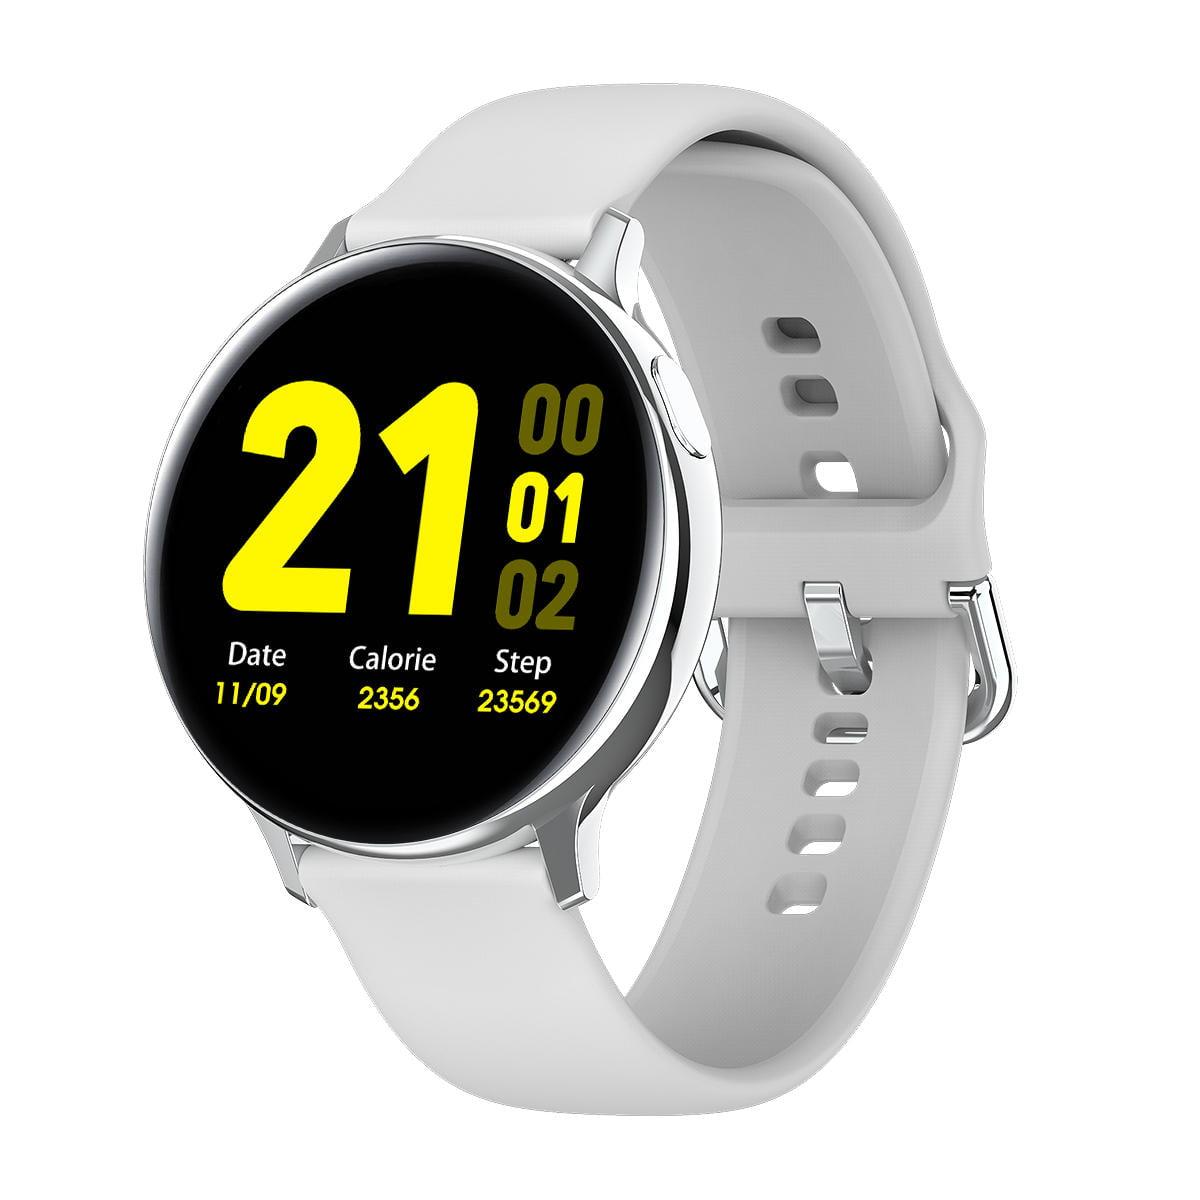 Bakeey smartwatch S20 ECG monitor smart watch heart rate monitor blood pressure (26)